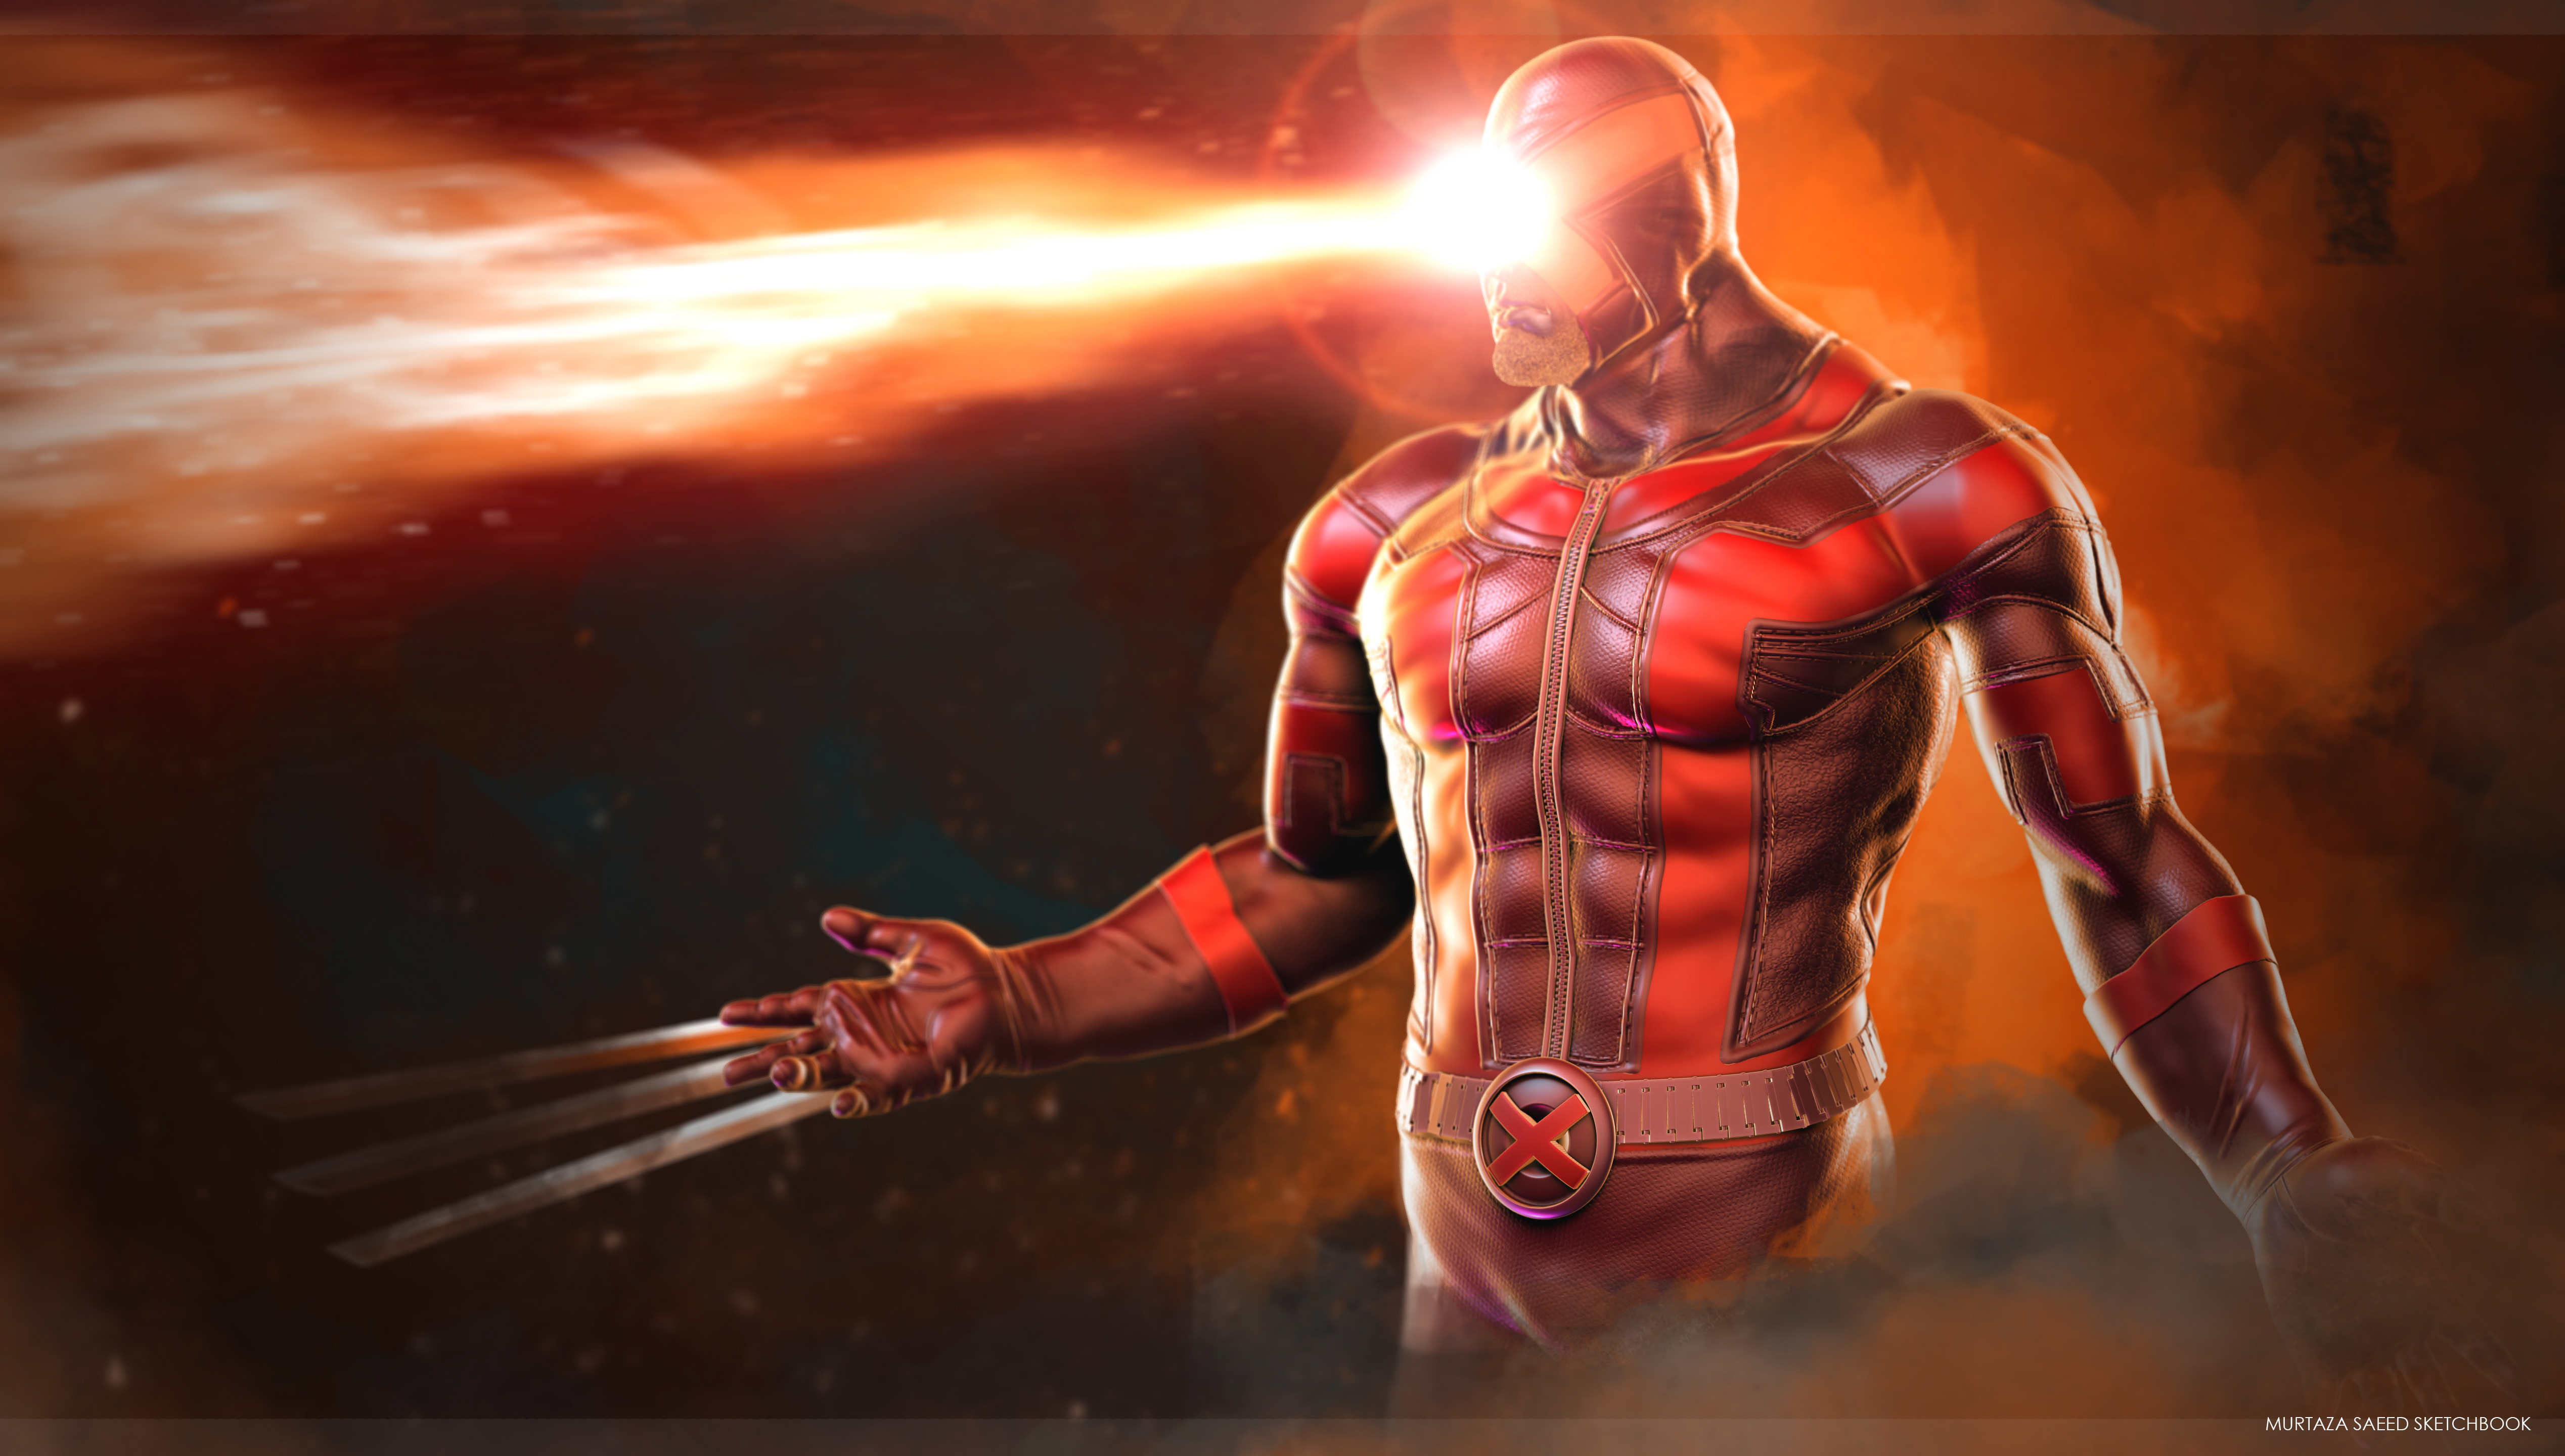 Cyclops daredevil wolverine artwork hd superheroes 4k wallpapers images backgrounds photos - Wallpaper wolverine 4k ...